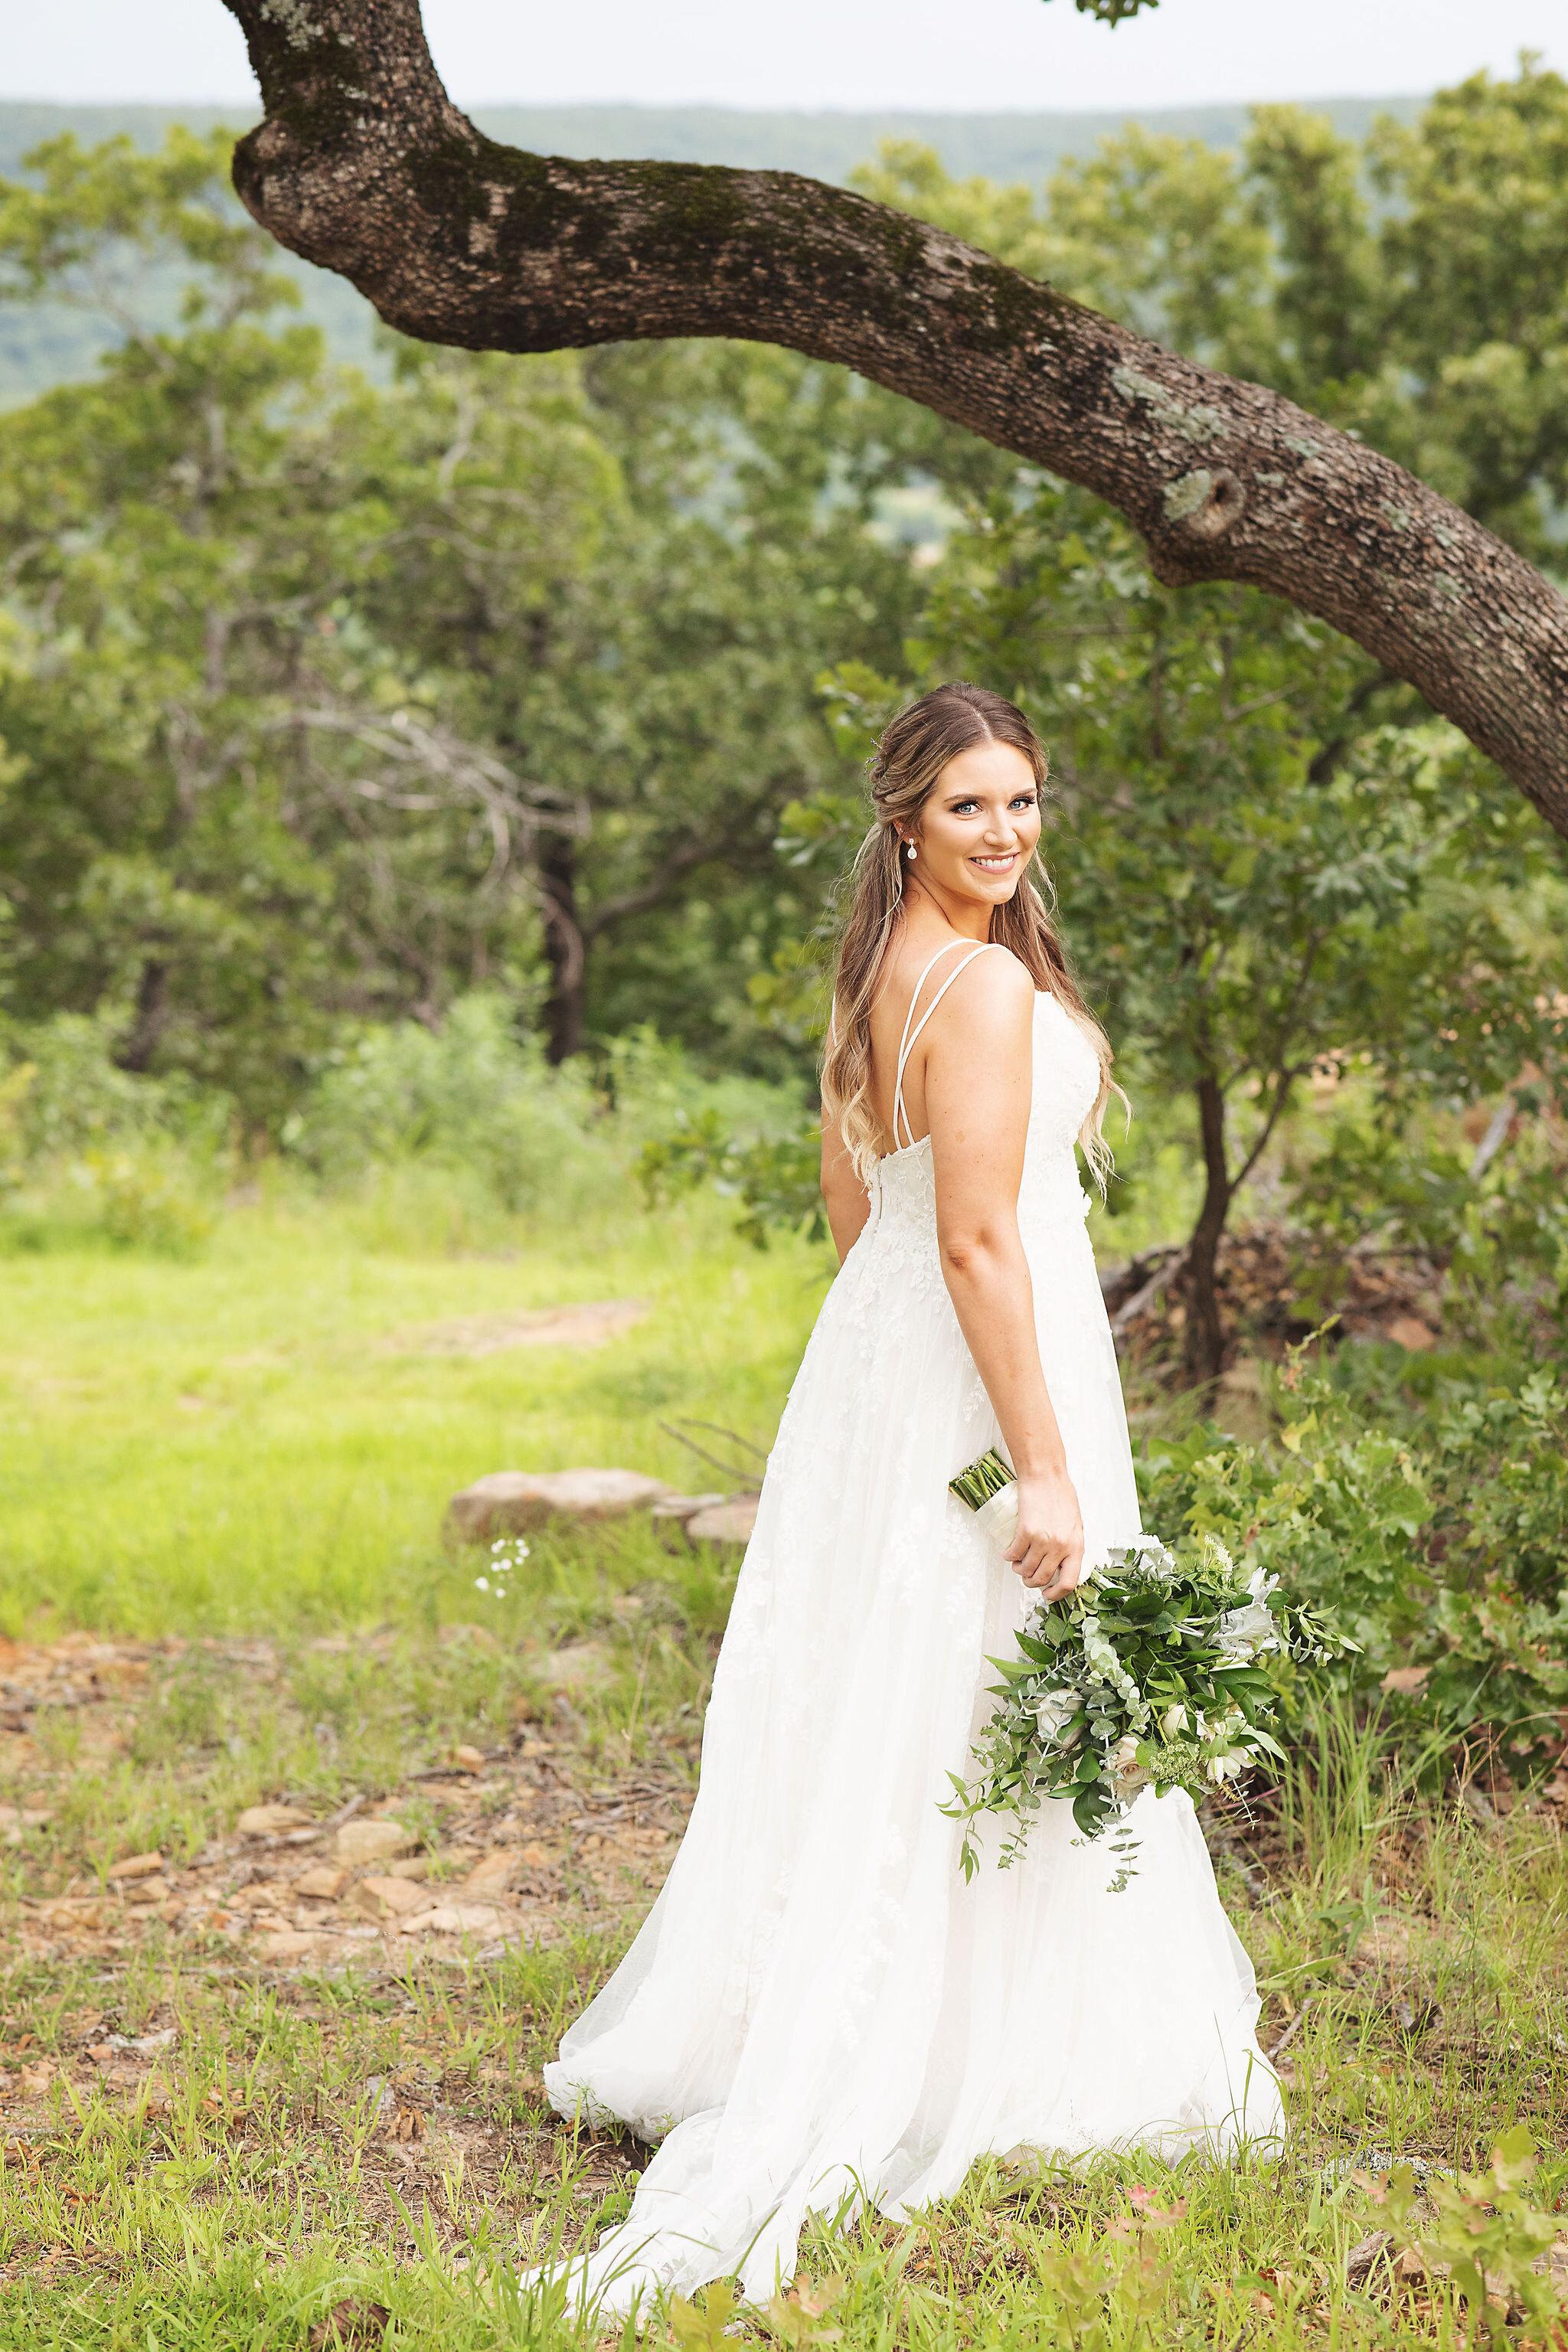 Oklahoma Summer Wedding Venue Dream Point Ranch 6.jpg